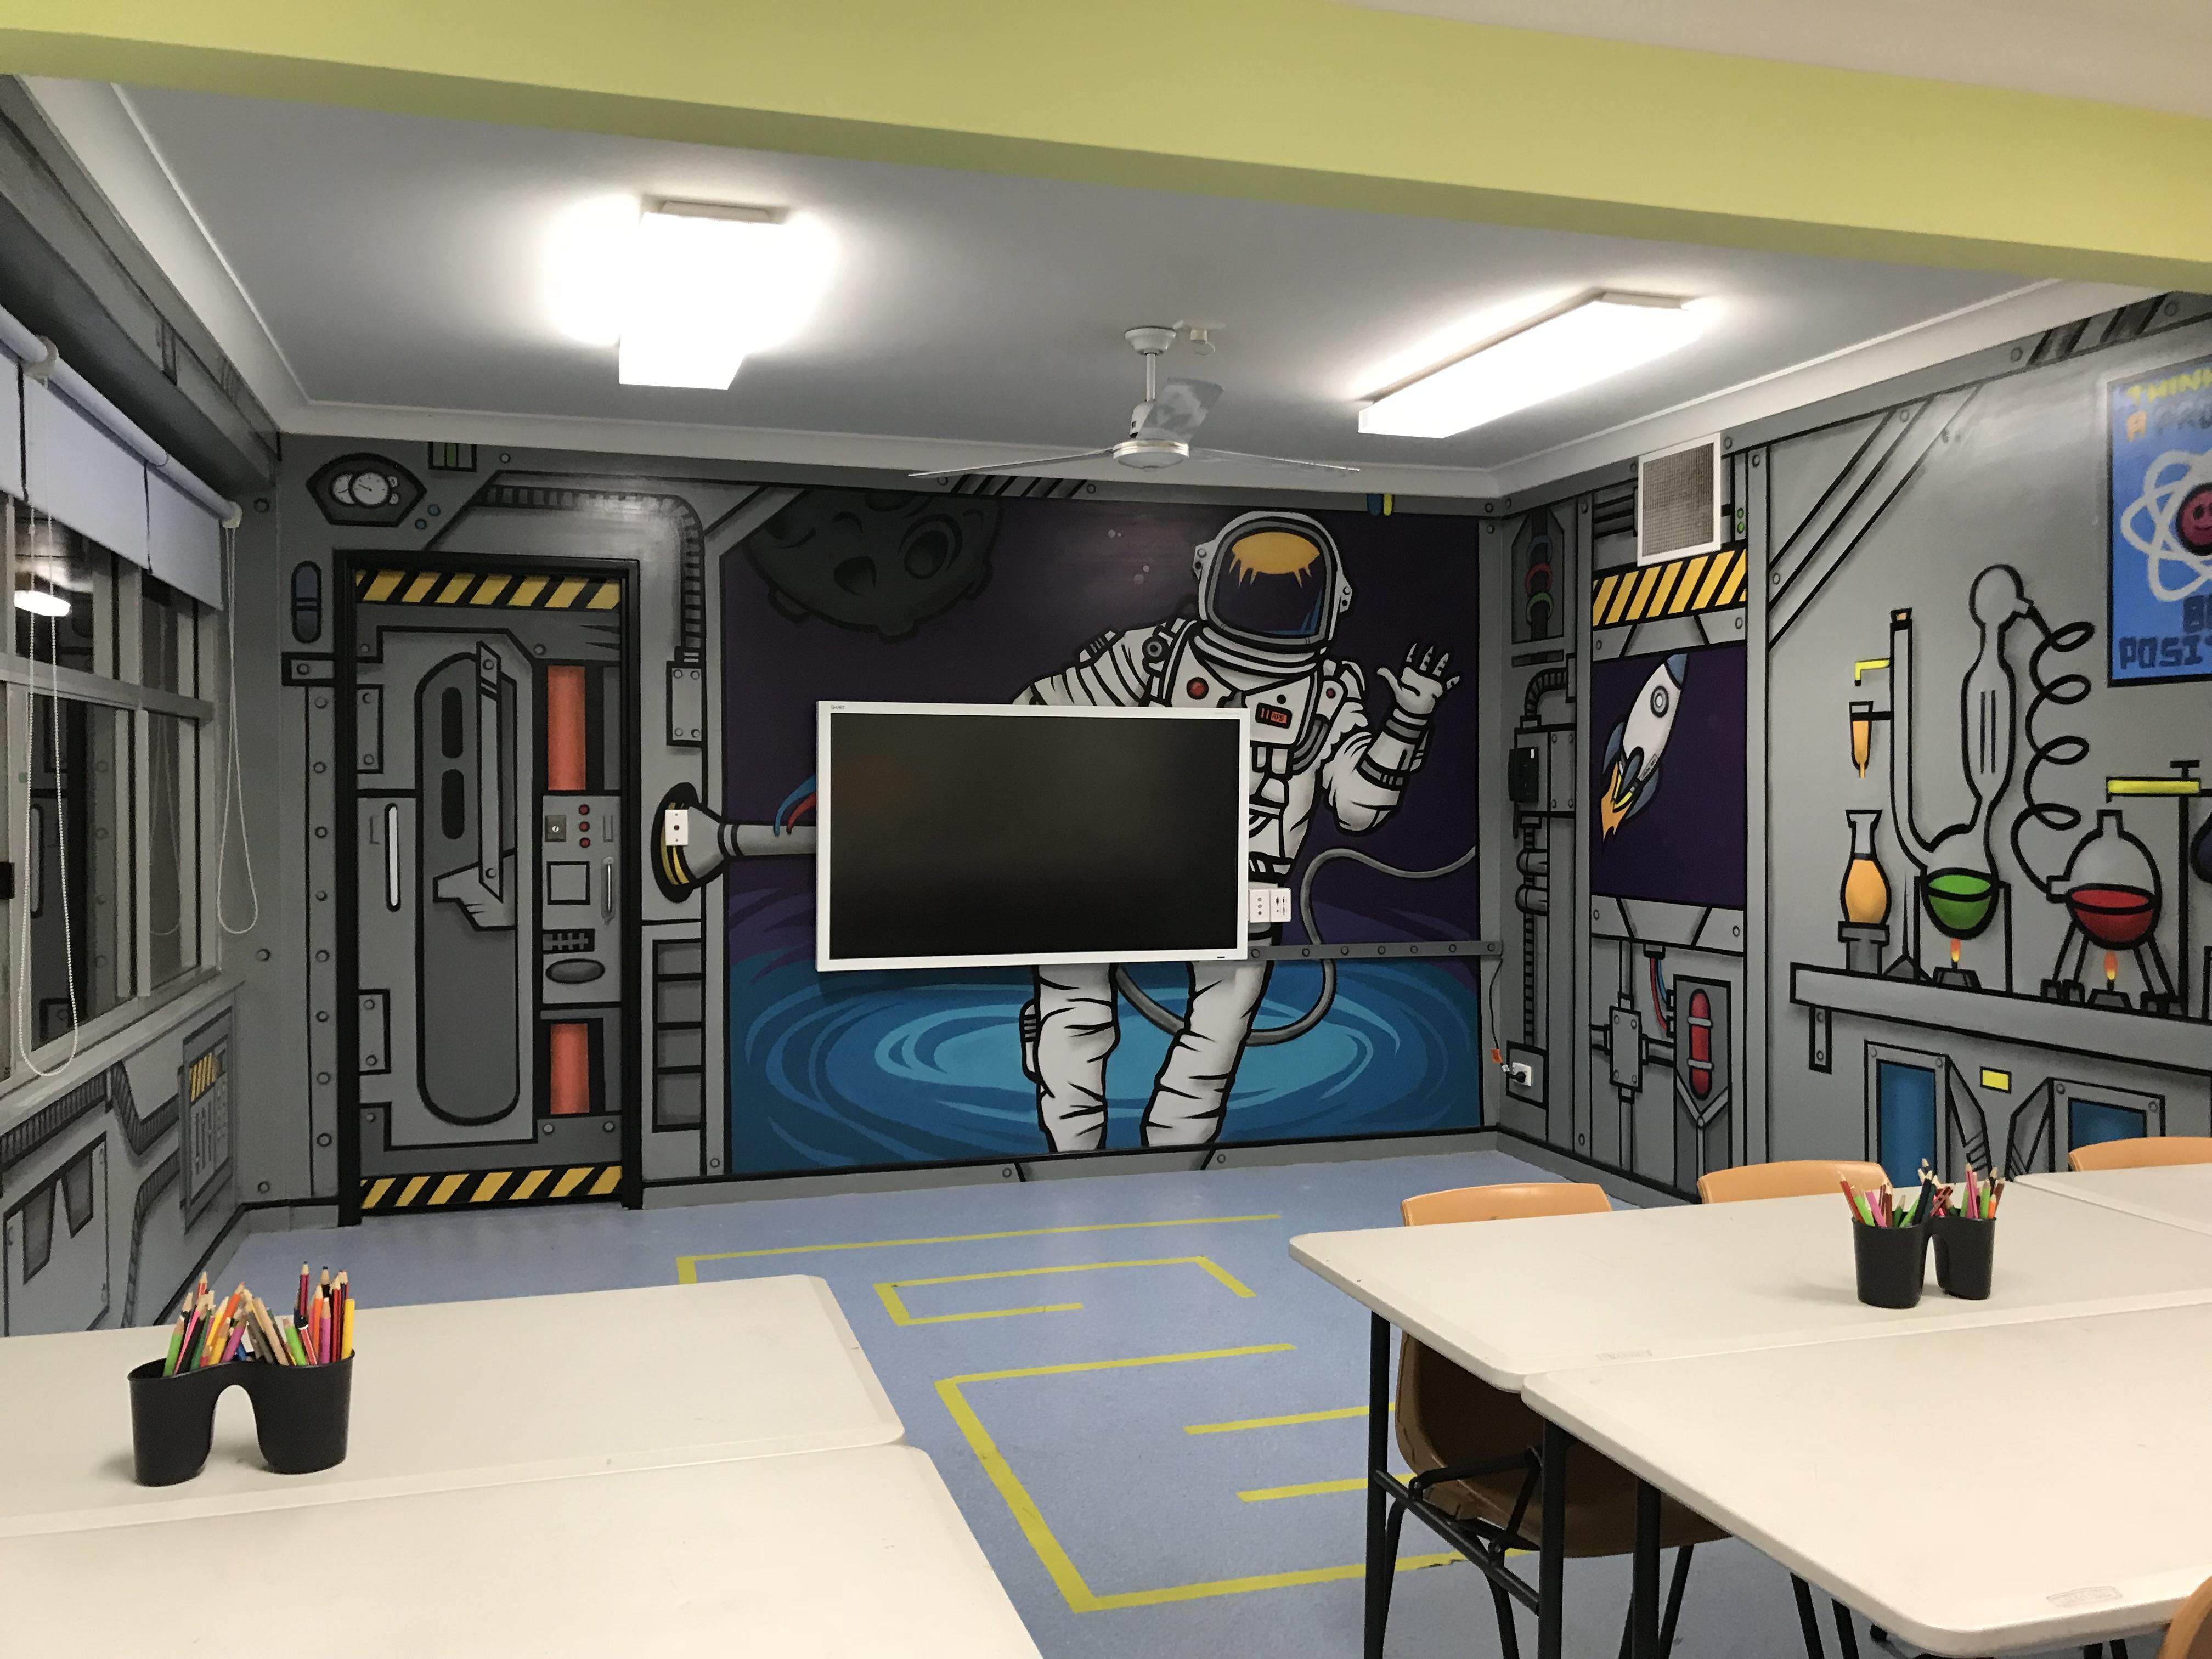 Classroom mural artwork for kids